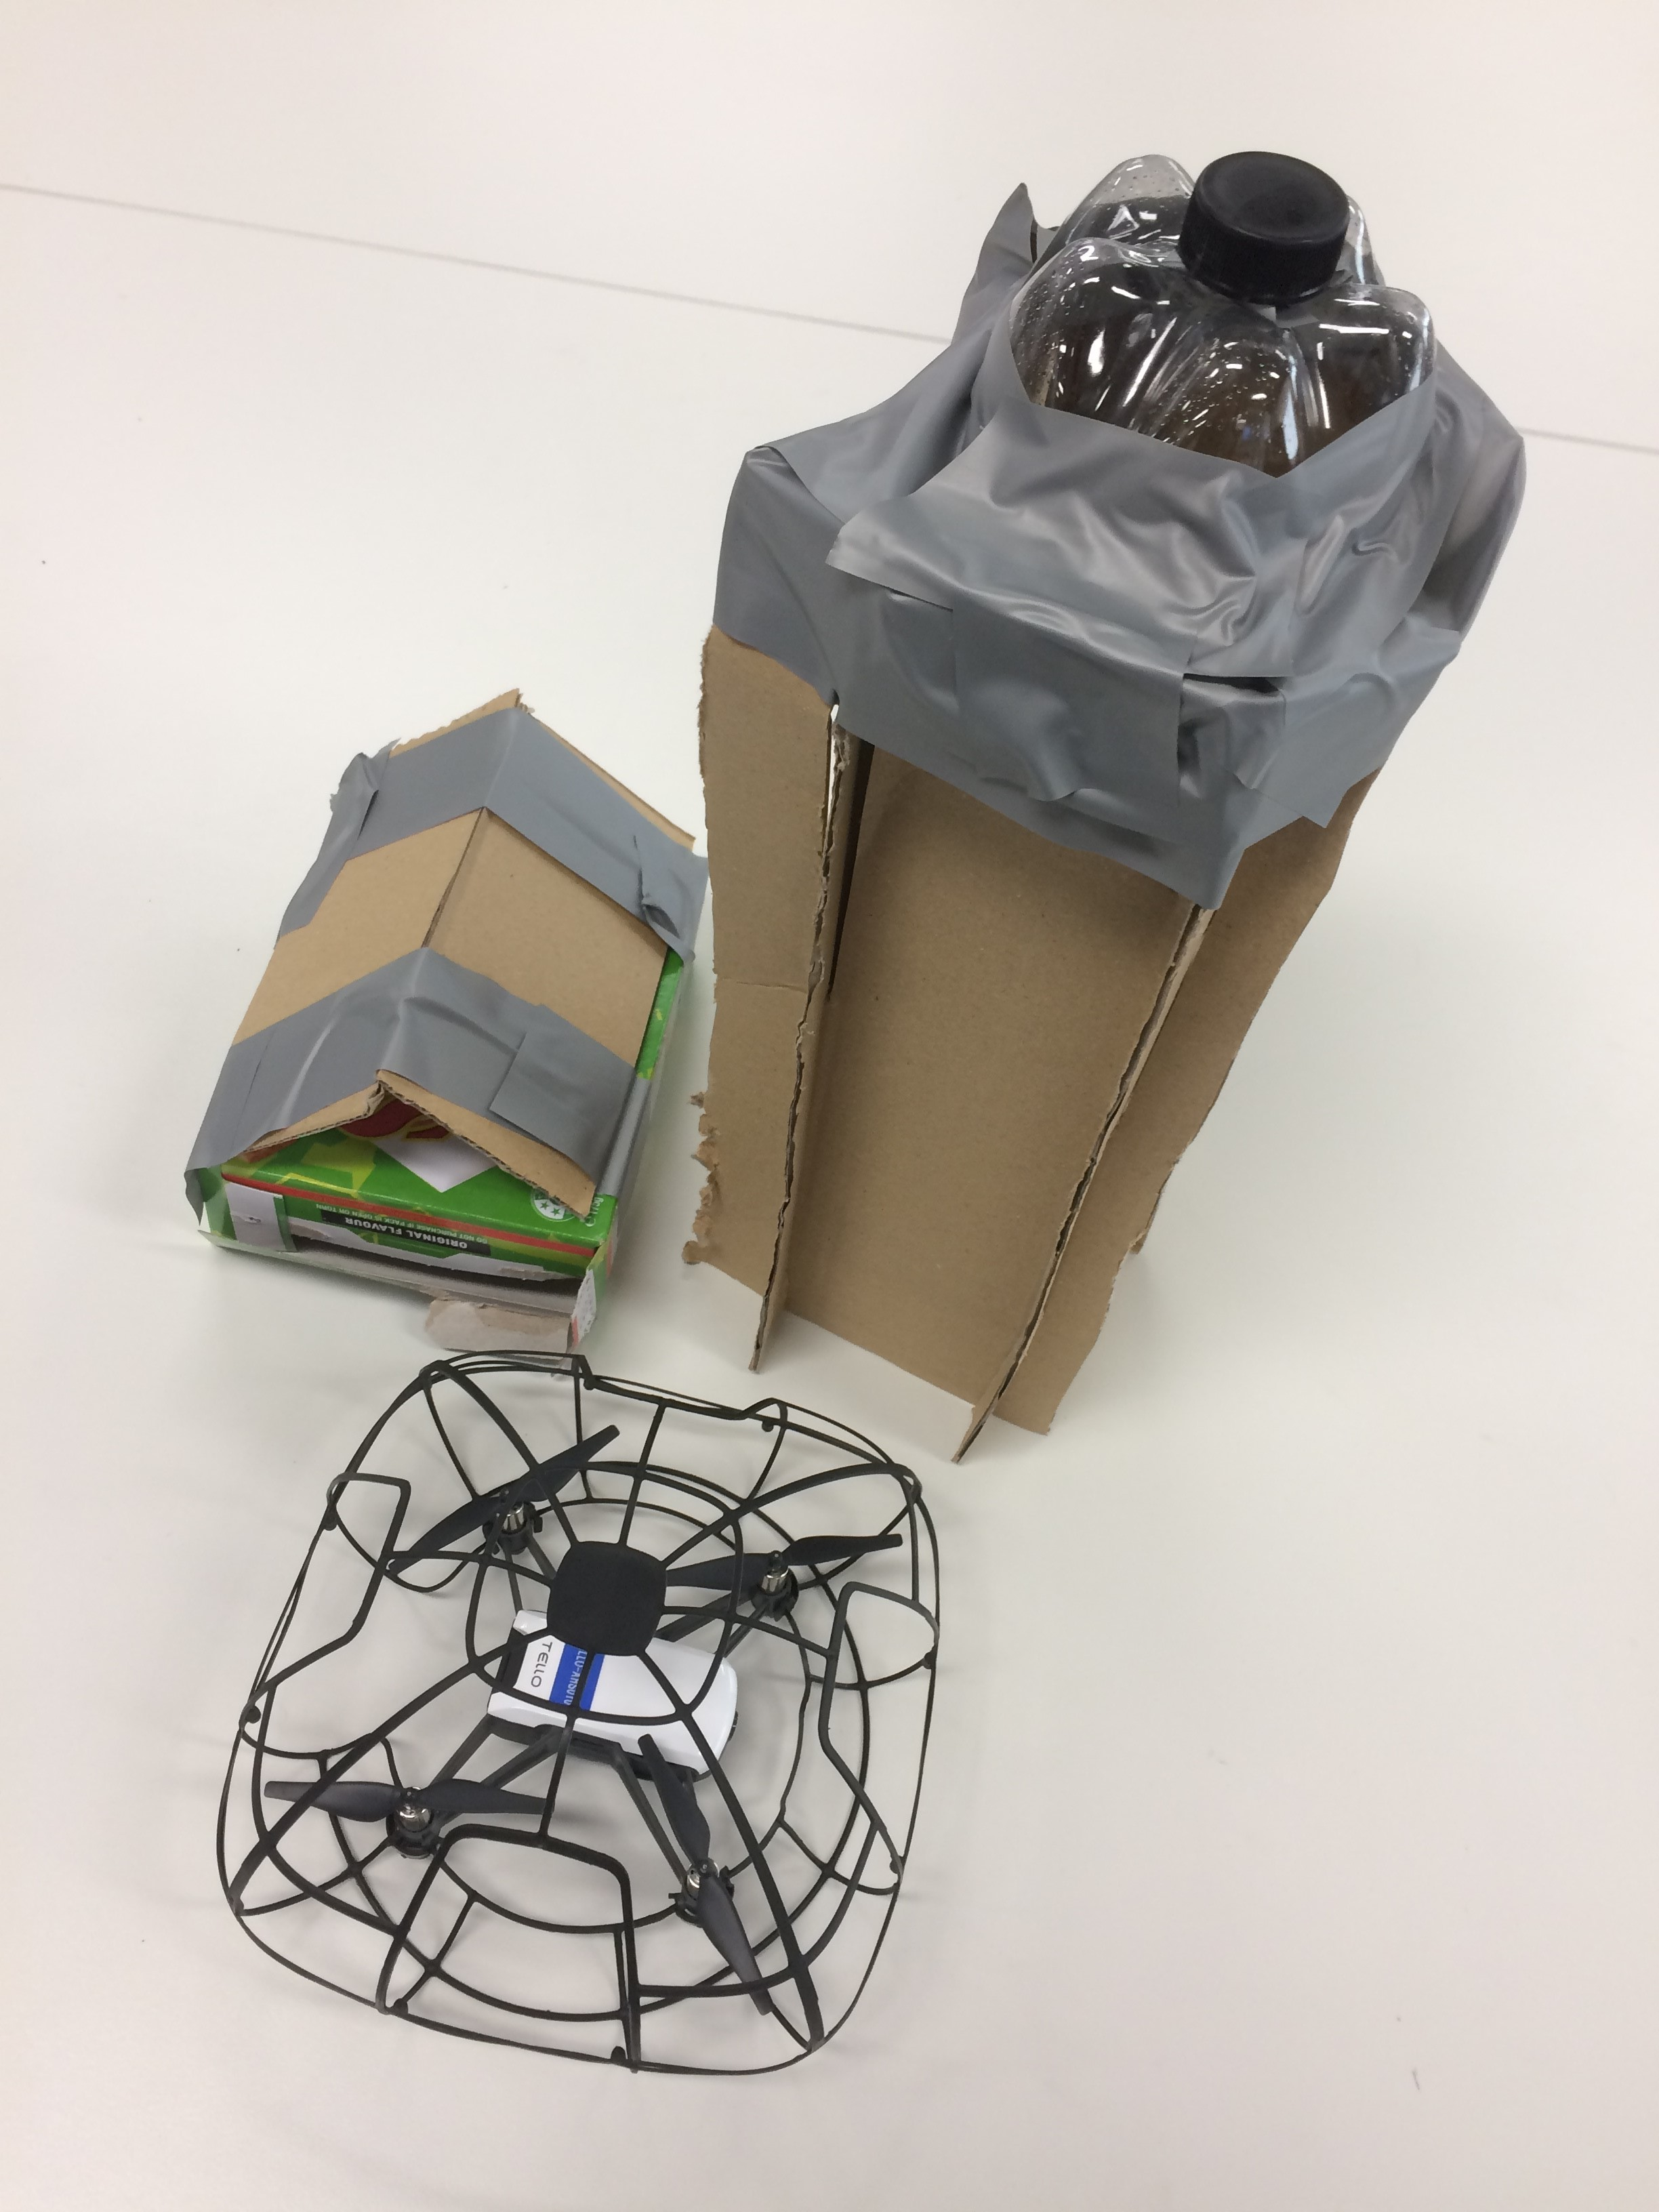 drones 14.jpg